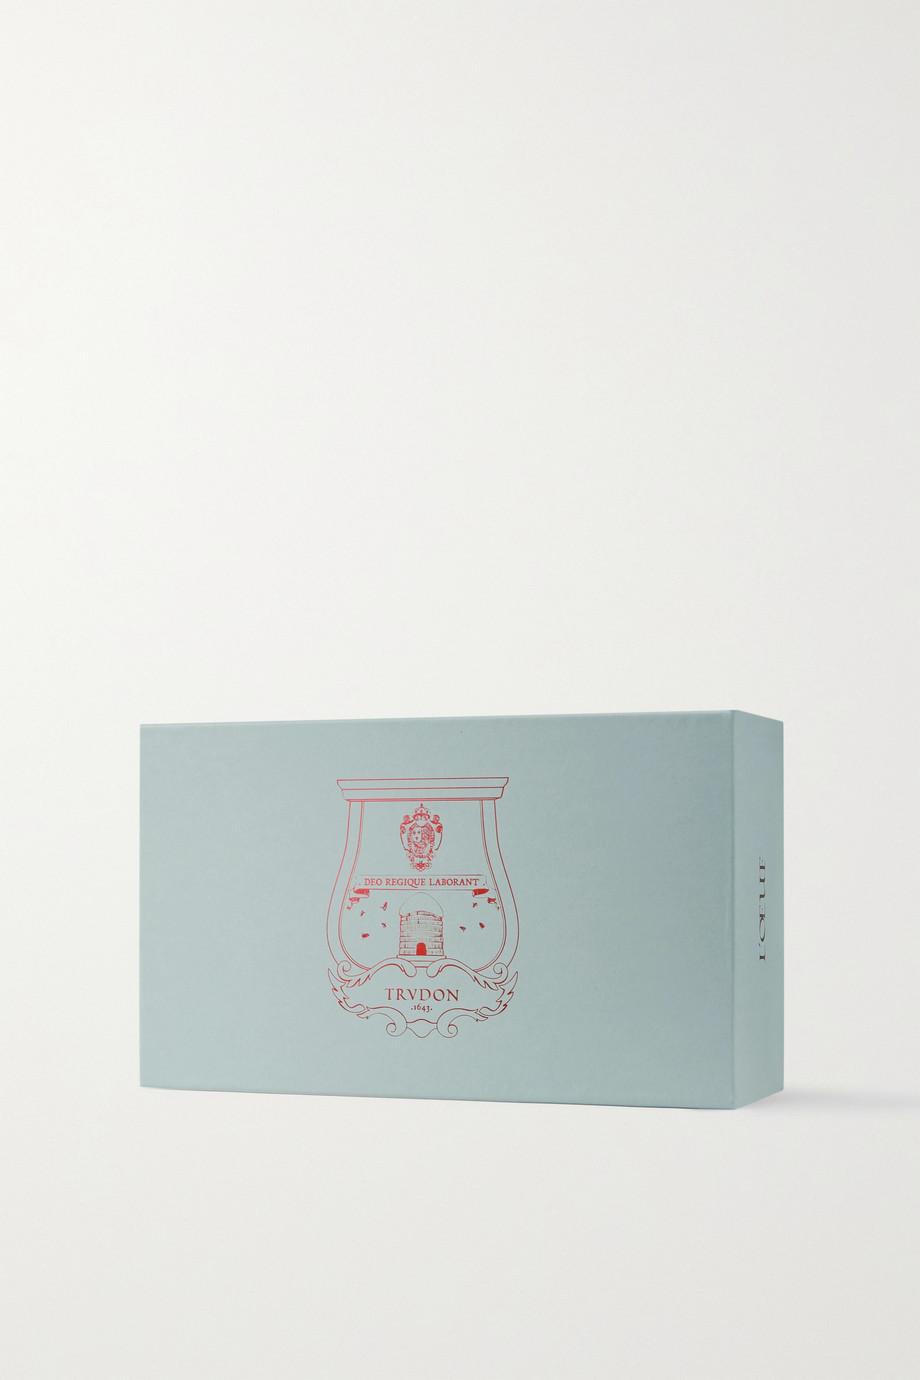 Cire Trudon Diffuseur de parfum L'Œuf, Cymos, 300 ml